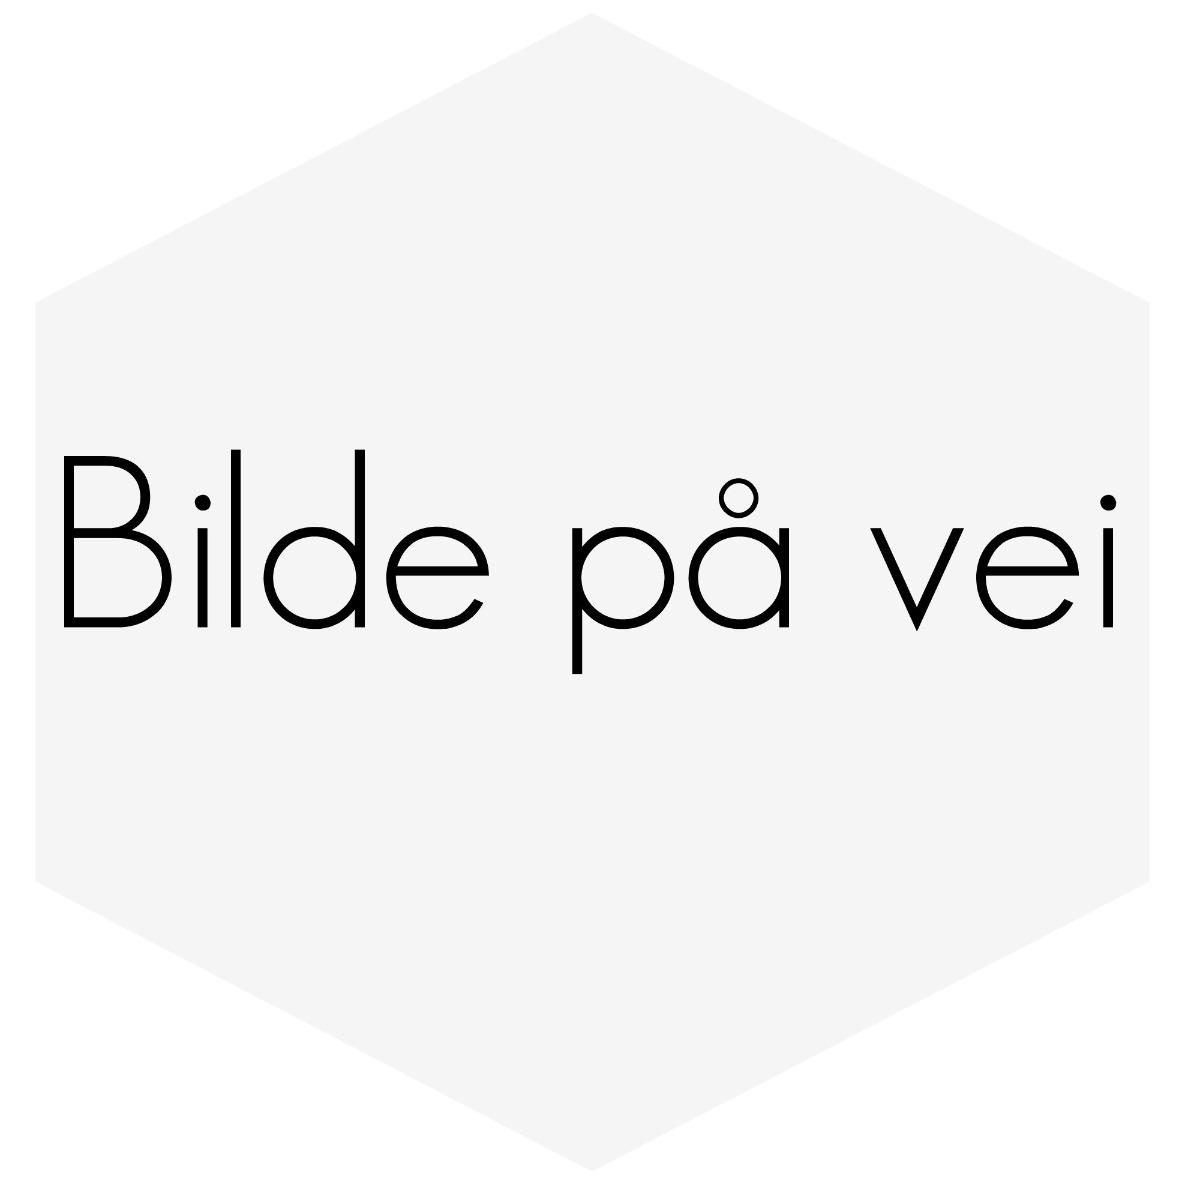 SILIKONSLANGE ARMERT BLÅ 0,3125'' (8MM),pris pr meter